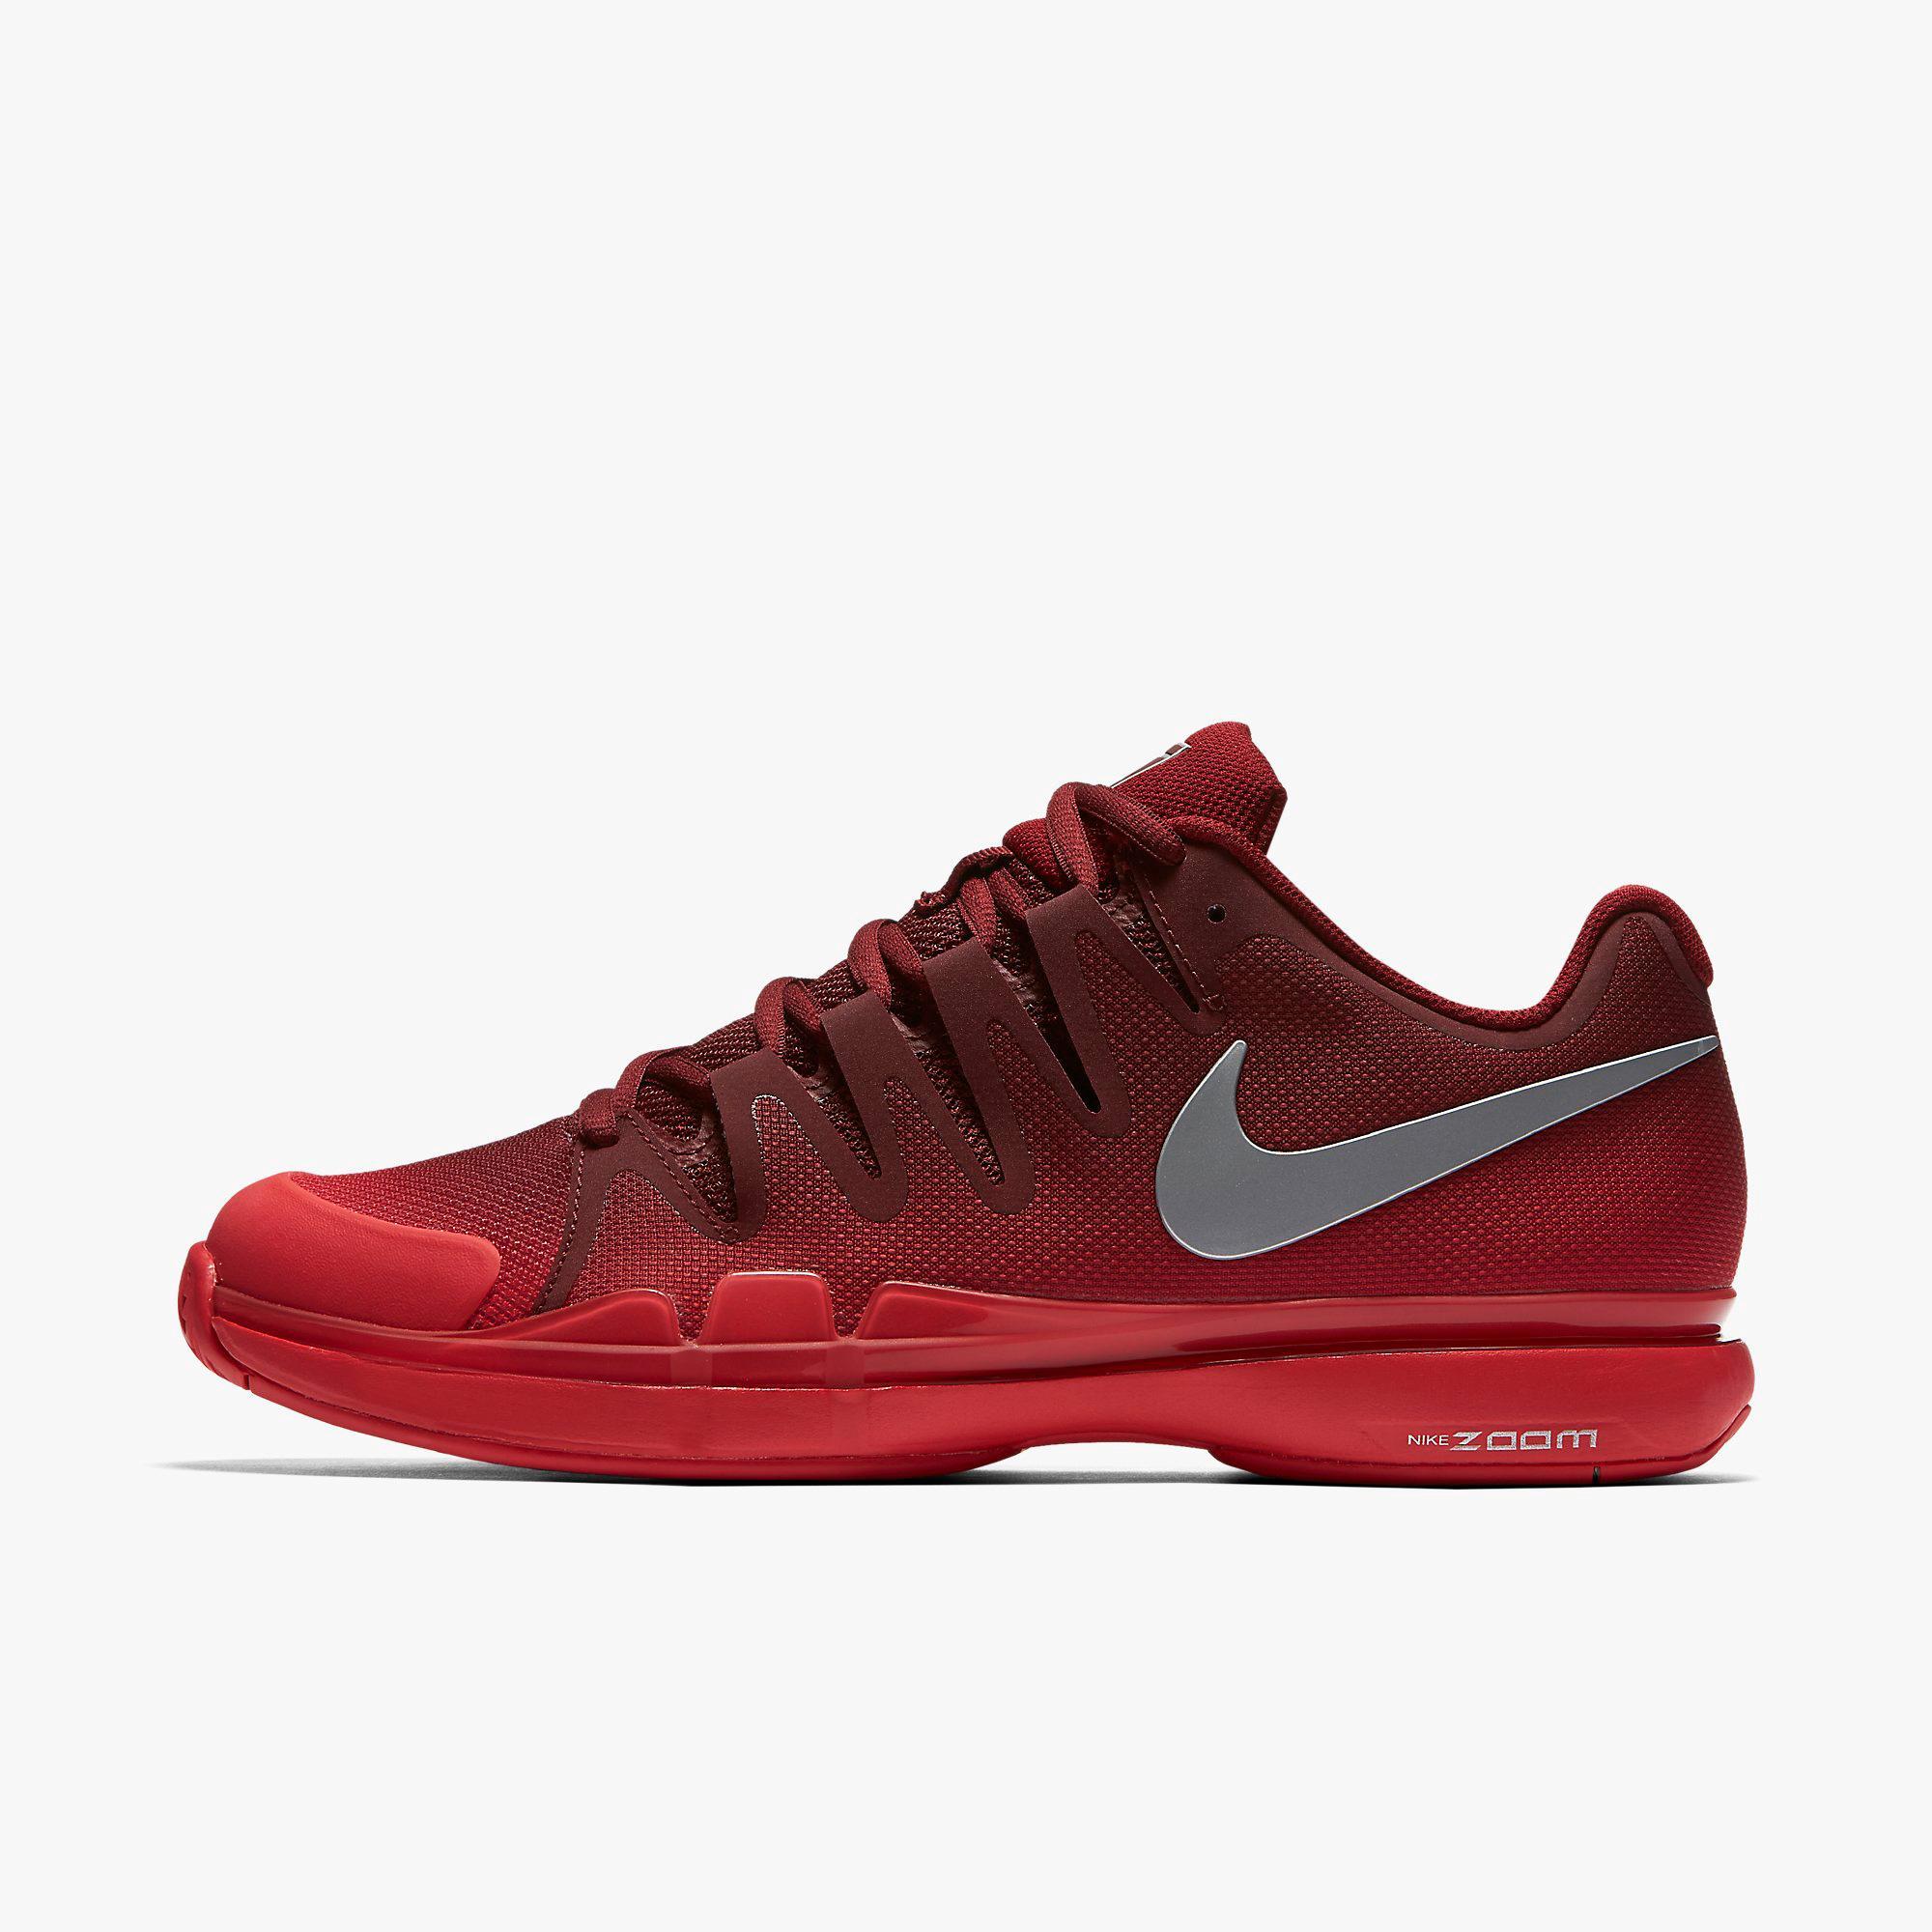 J Crew Mens Nike Shoes